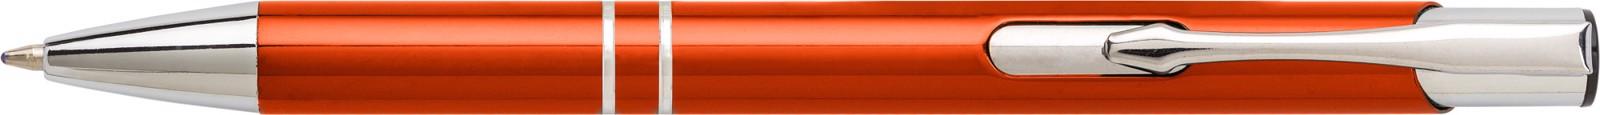 Aluminium ballpen - Orange